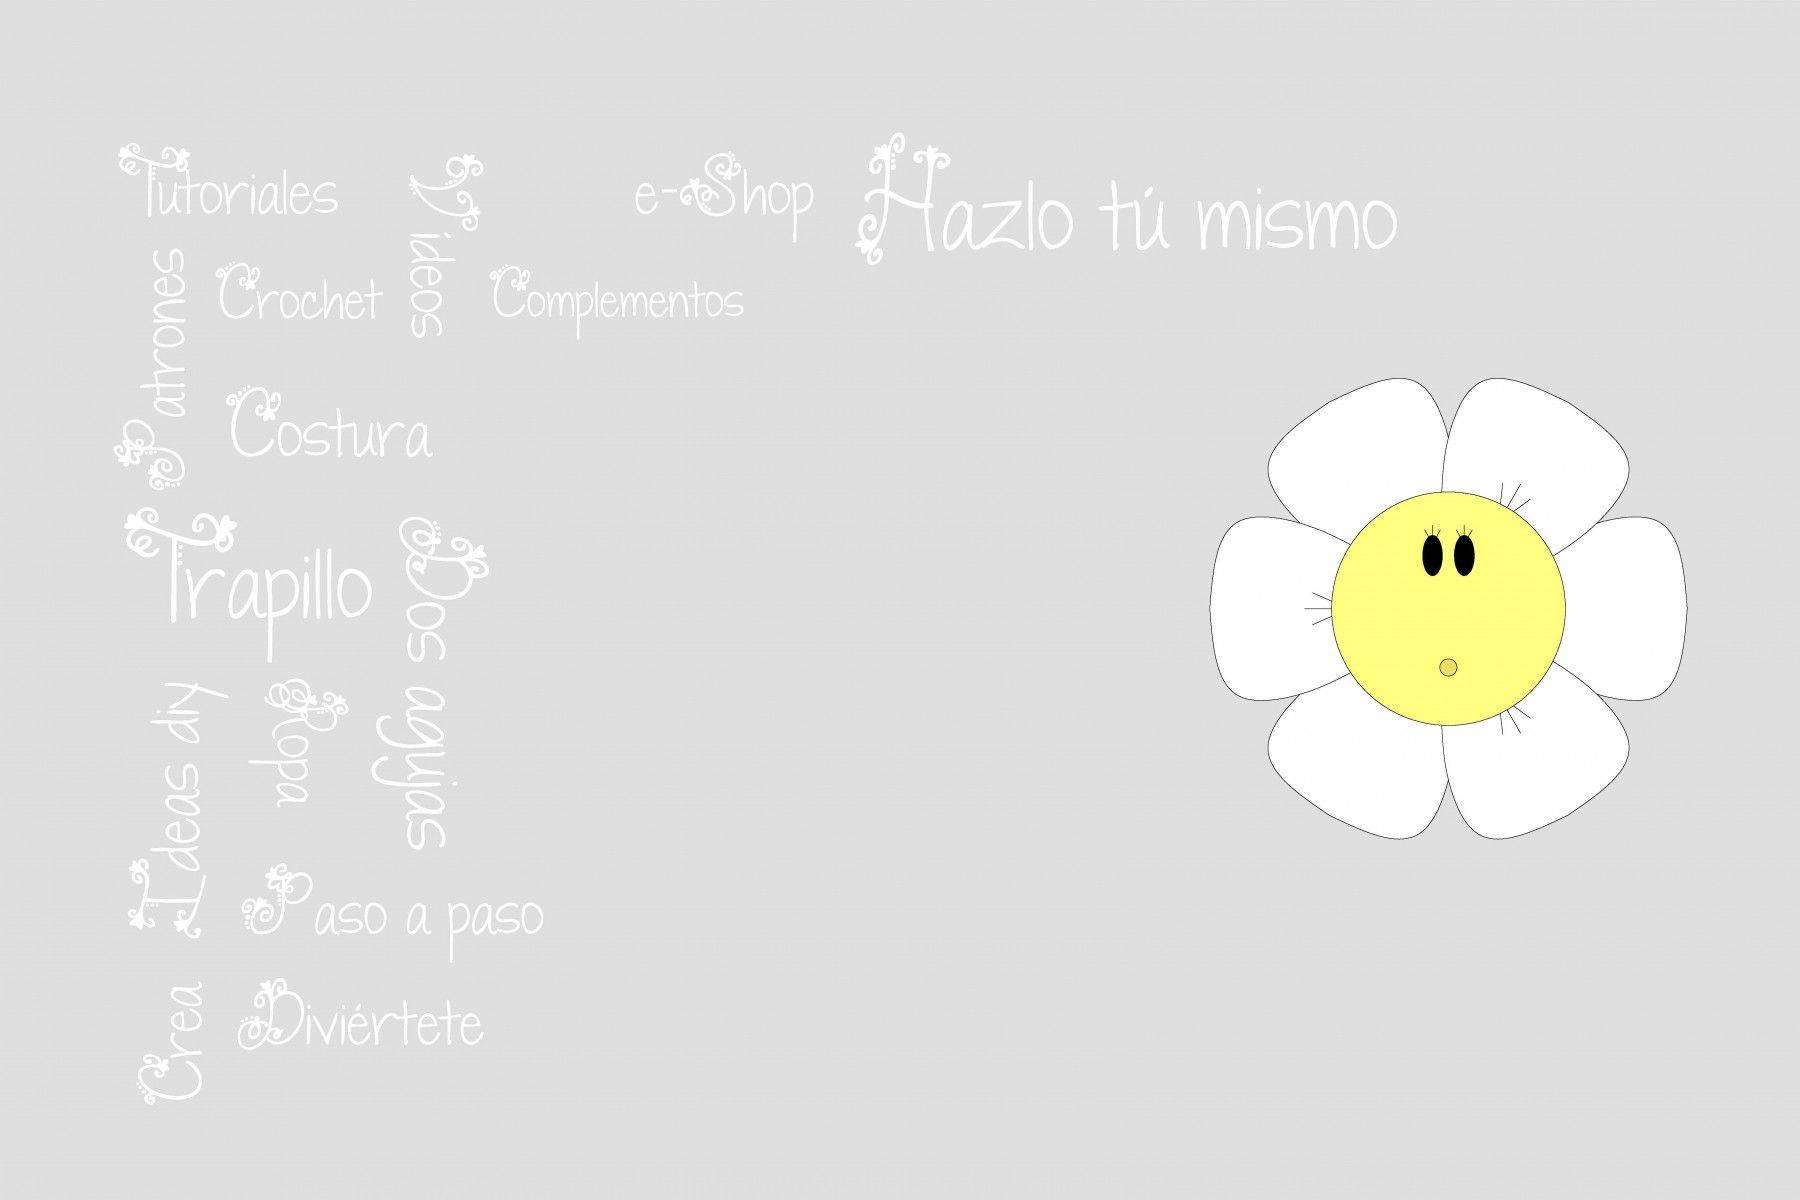 BUFANDA INFINITA – CucoCuco